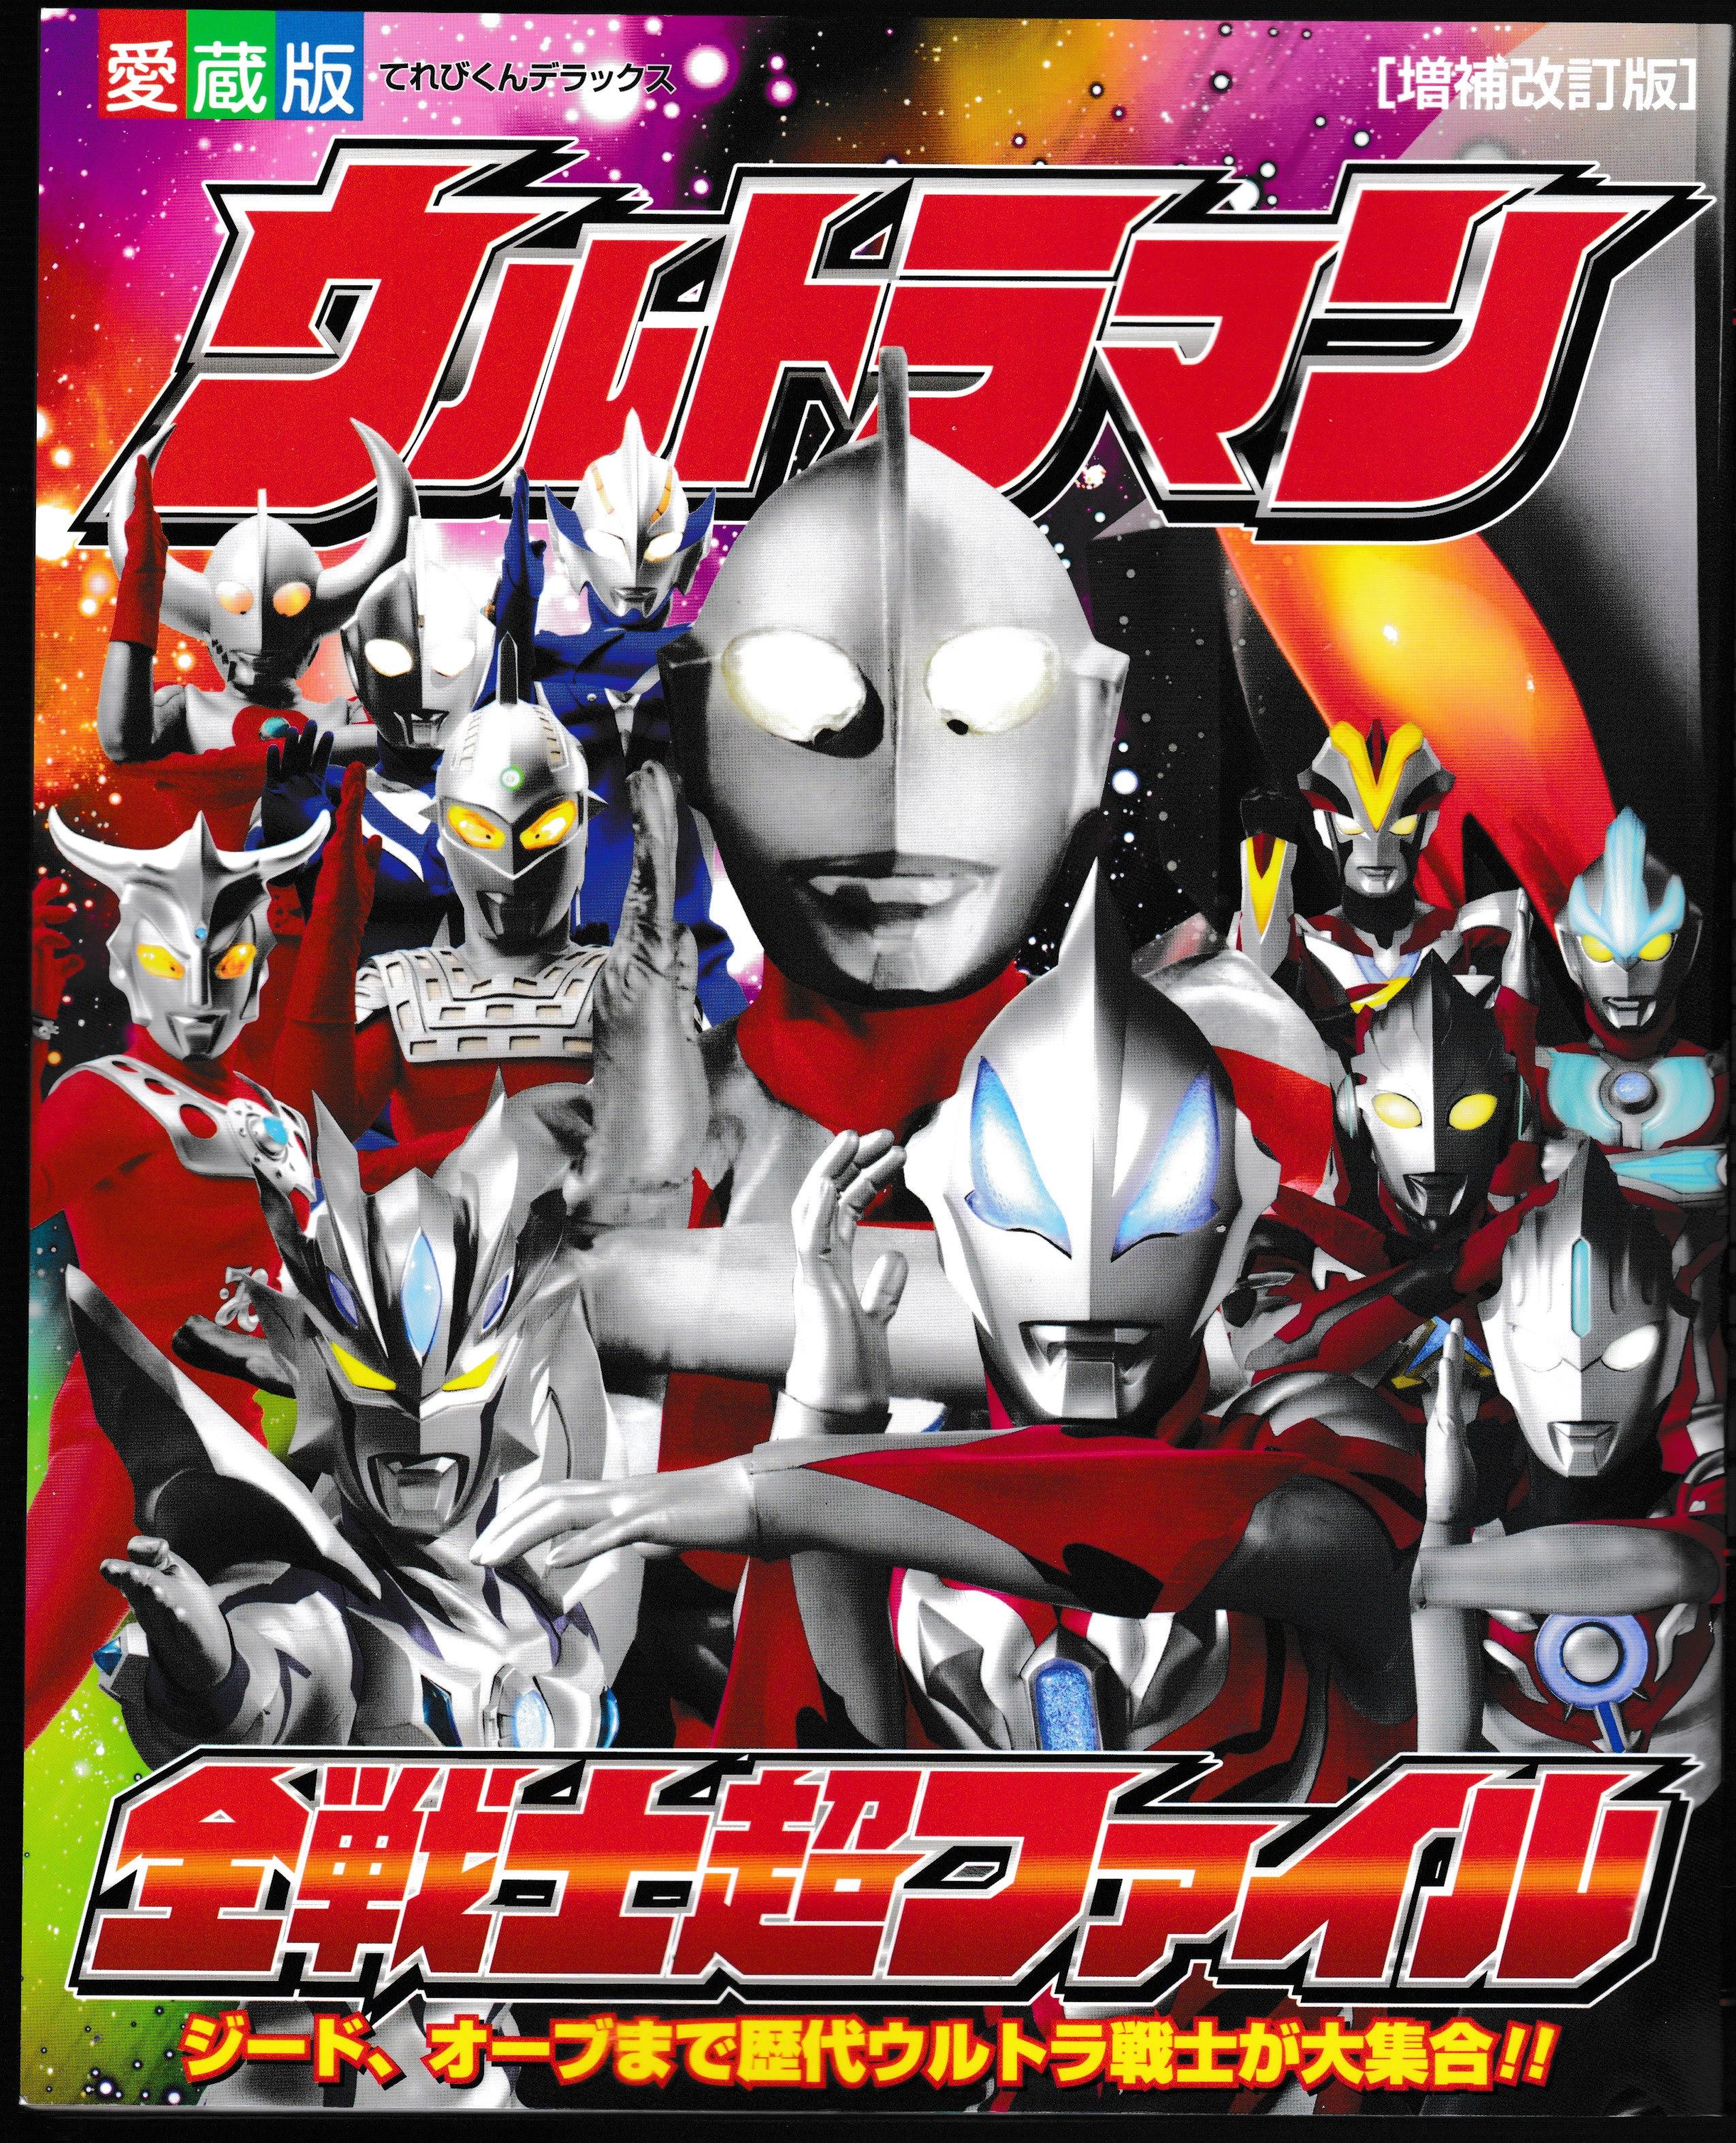 Crazybeard1234/All Ultraman File 2017